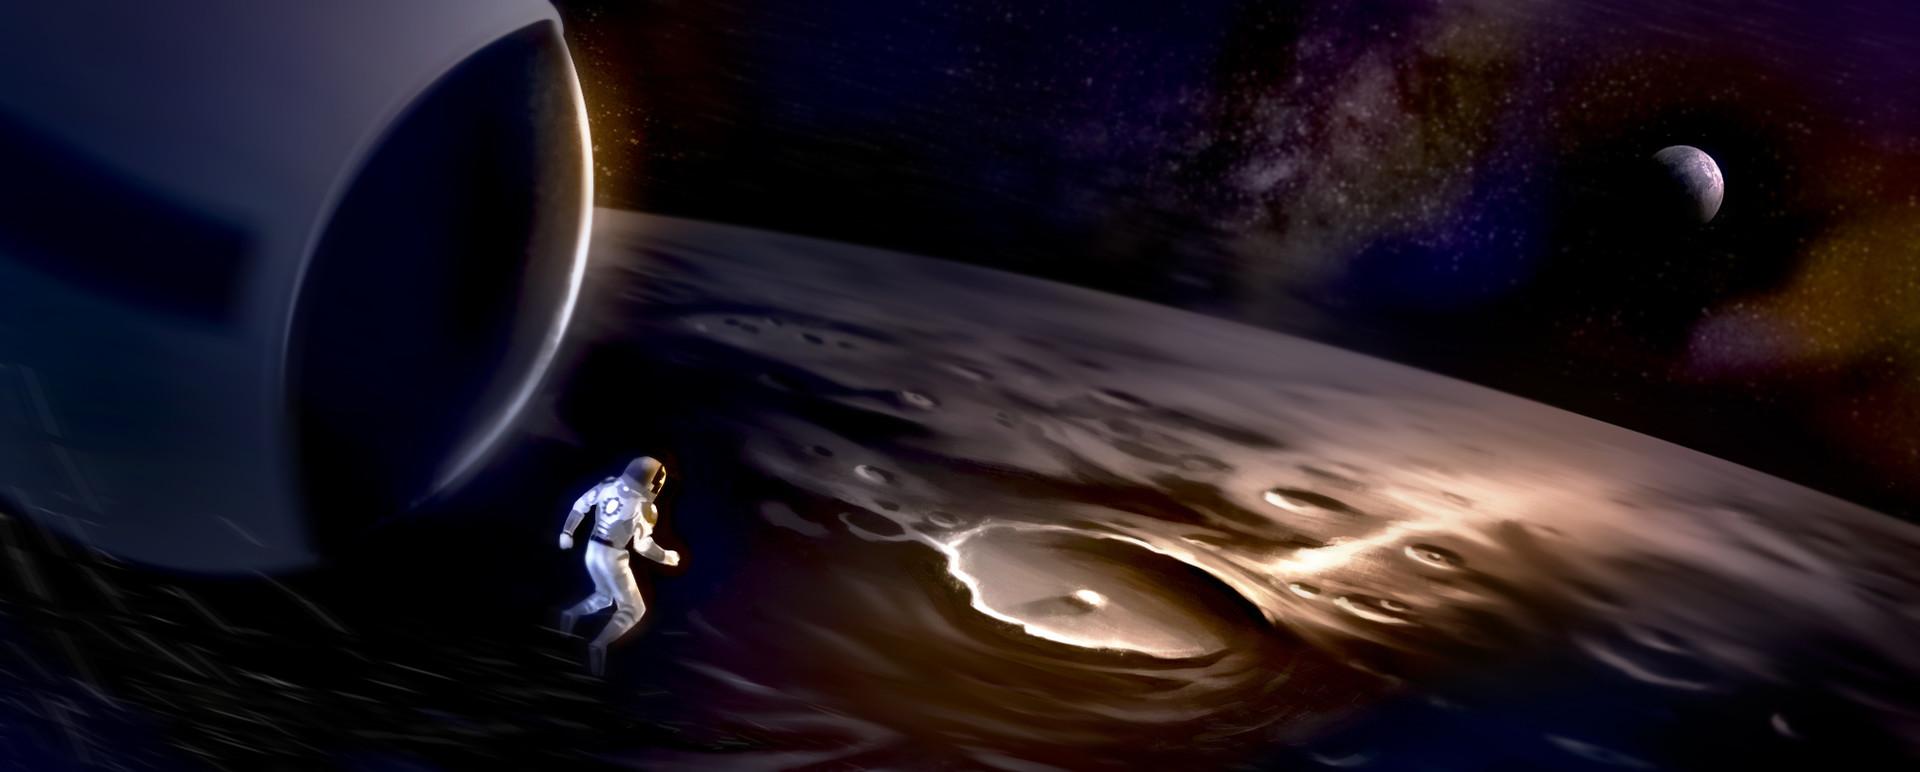 Romel rojas concept ori luna astronauta 5